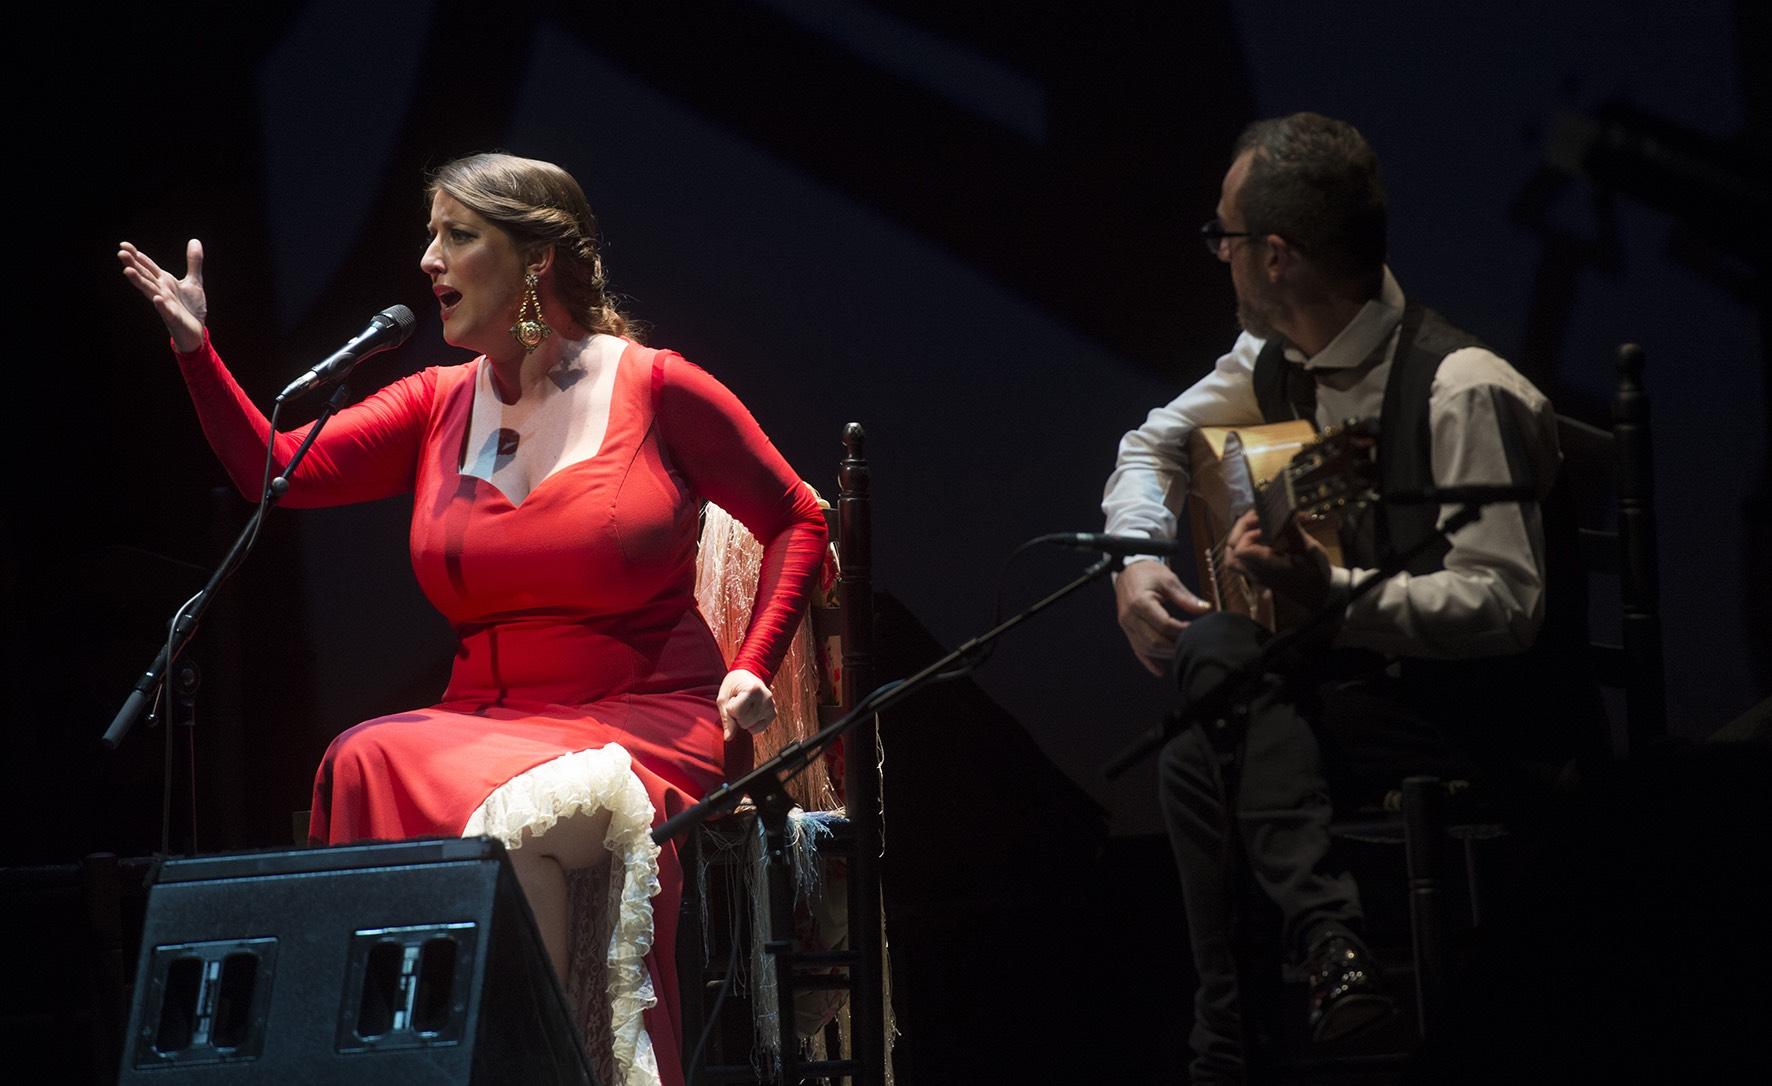 <p>La cantaora Argentina inauguró la Suma Flamenca 2017 en los Teatros del Canal.</p>